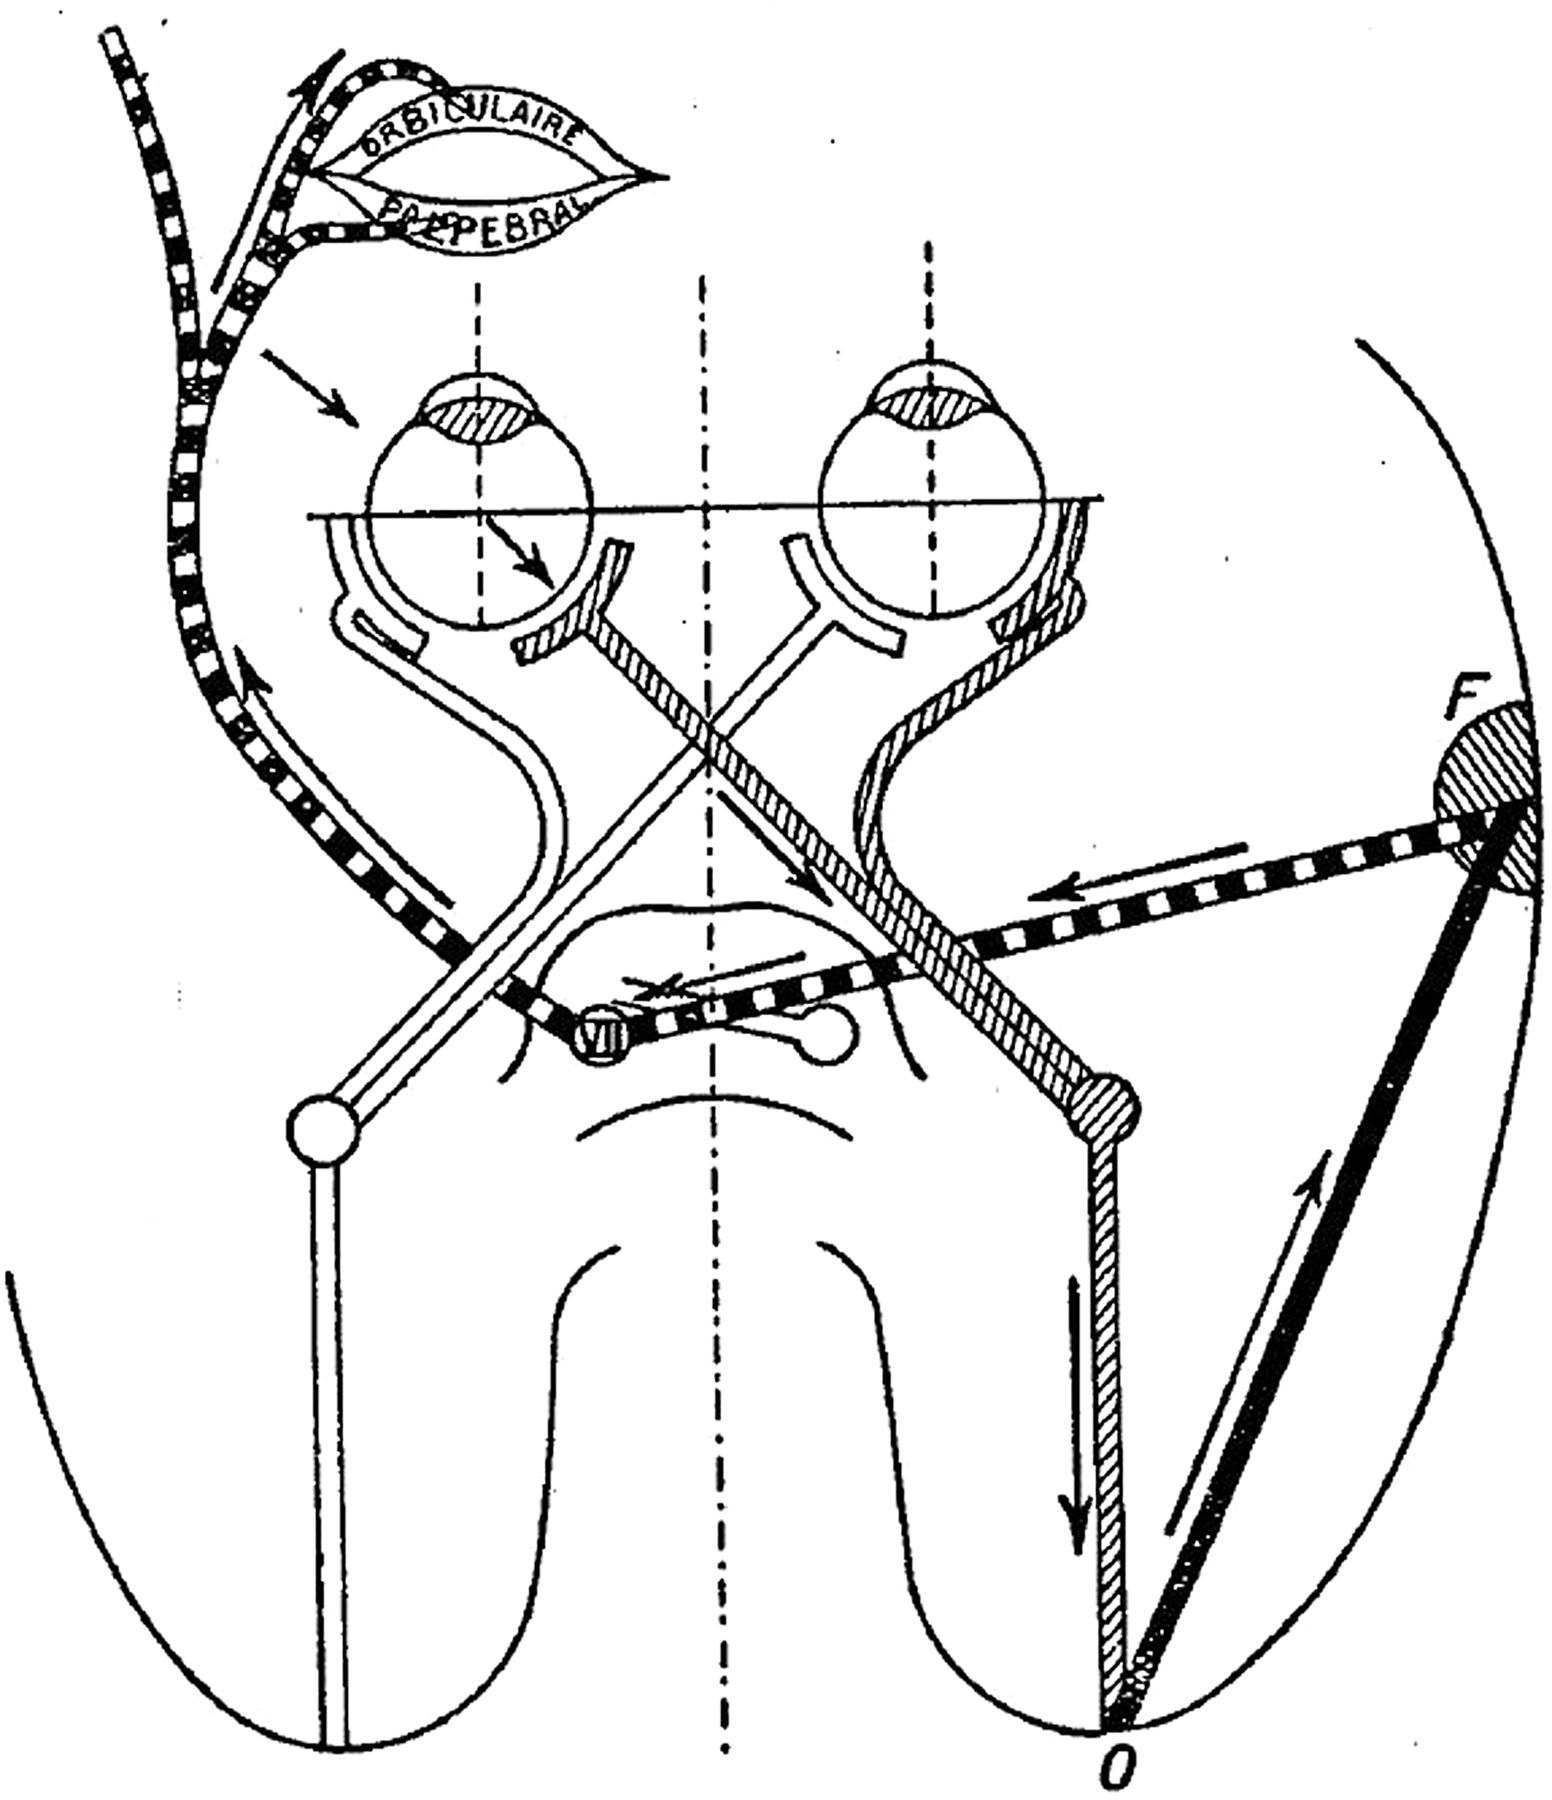 The menace reflex | Practical Neurology